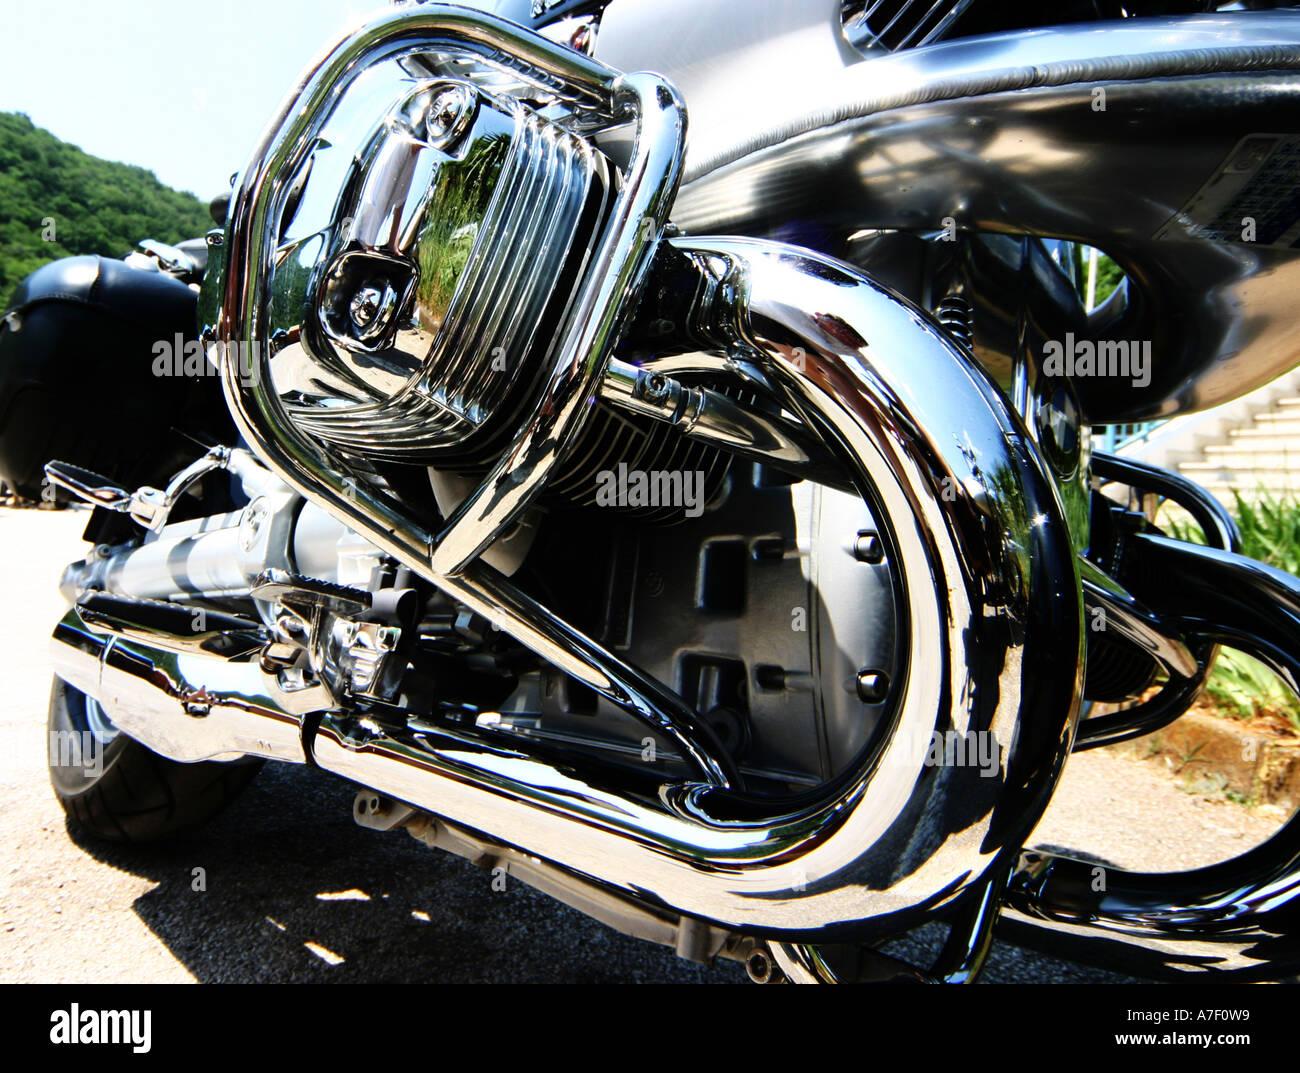 Closeup of polished engine on BMW motorcycle Stock Photo